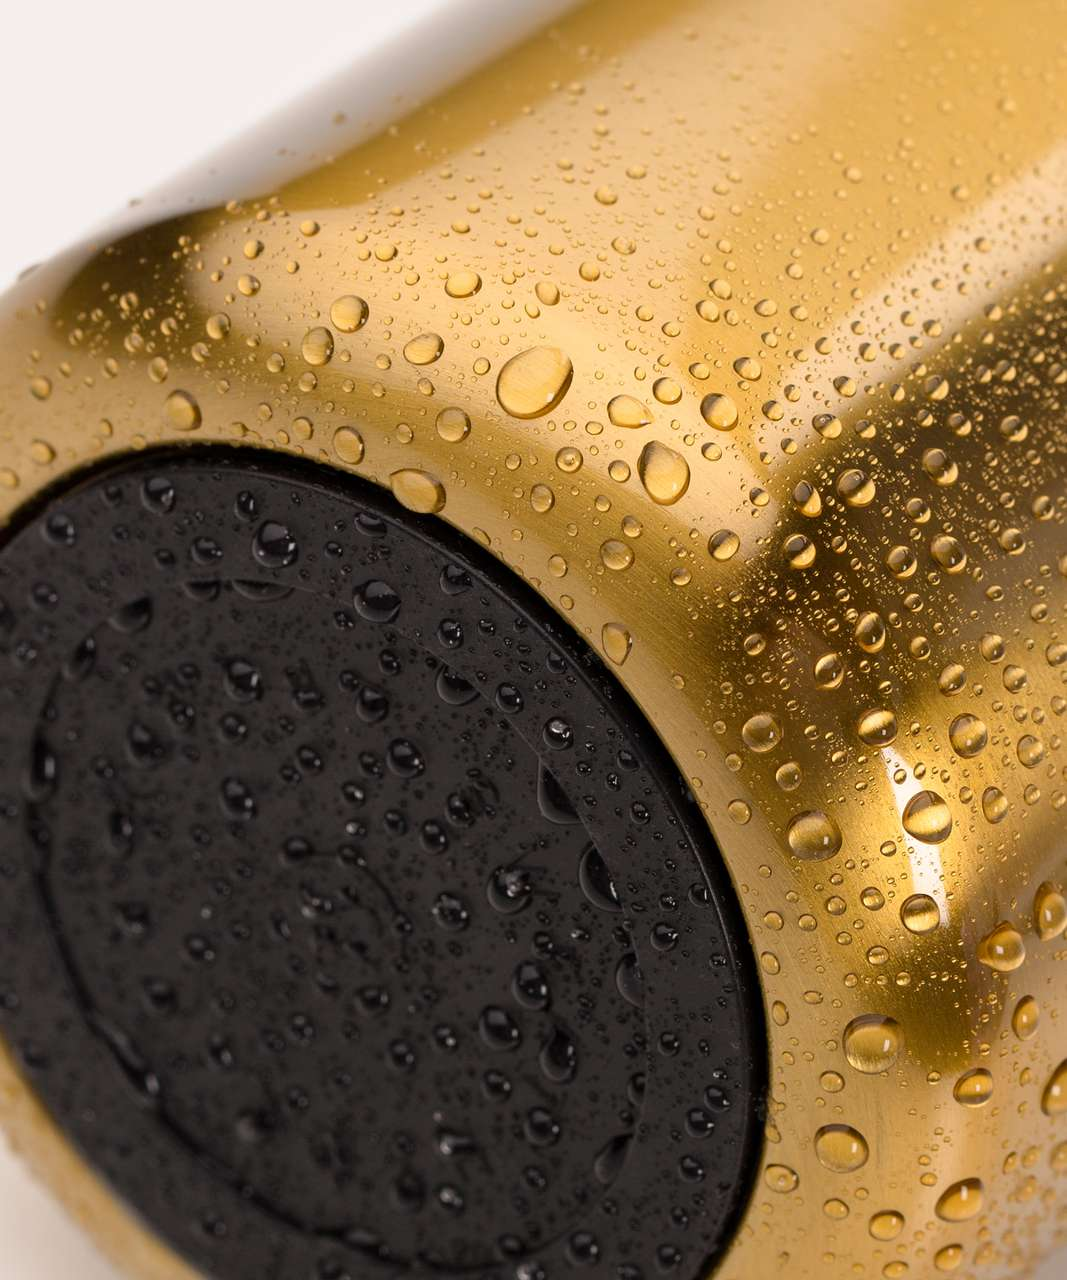 e49a5085e2 Lululemon Refresh Hot/Cold Bottle - Brushed Gold - lulu fanatics